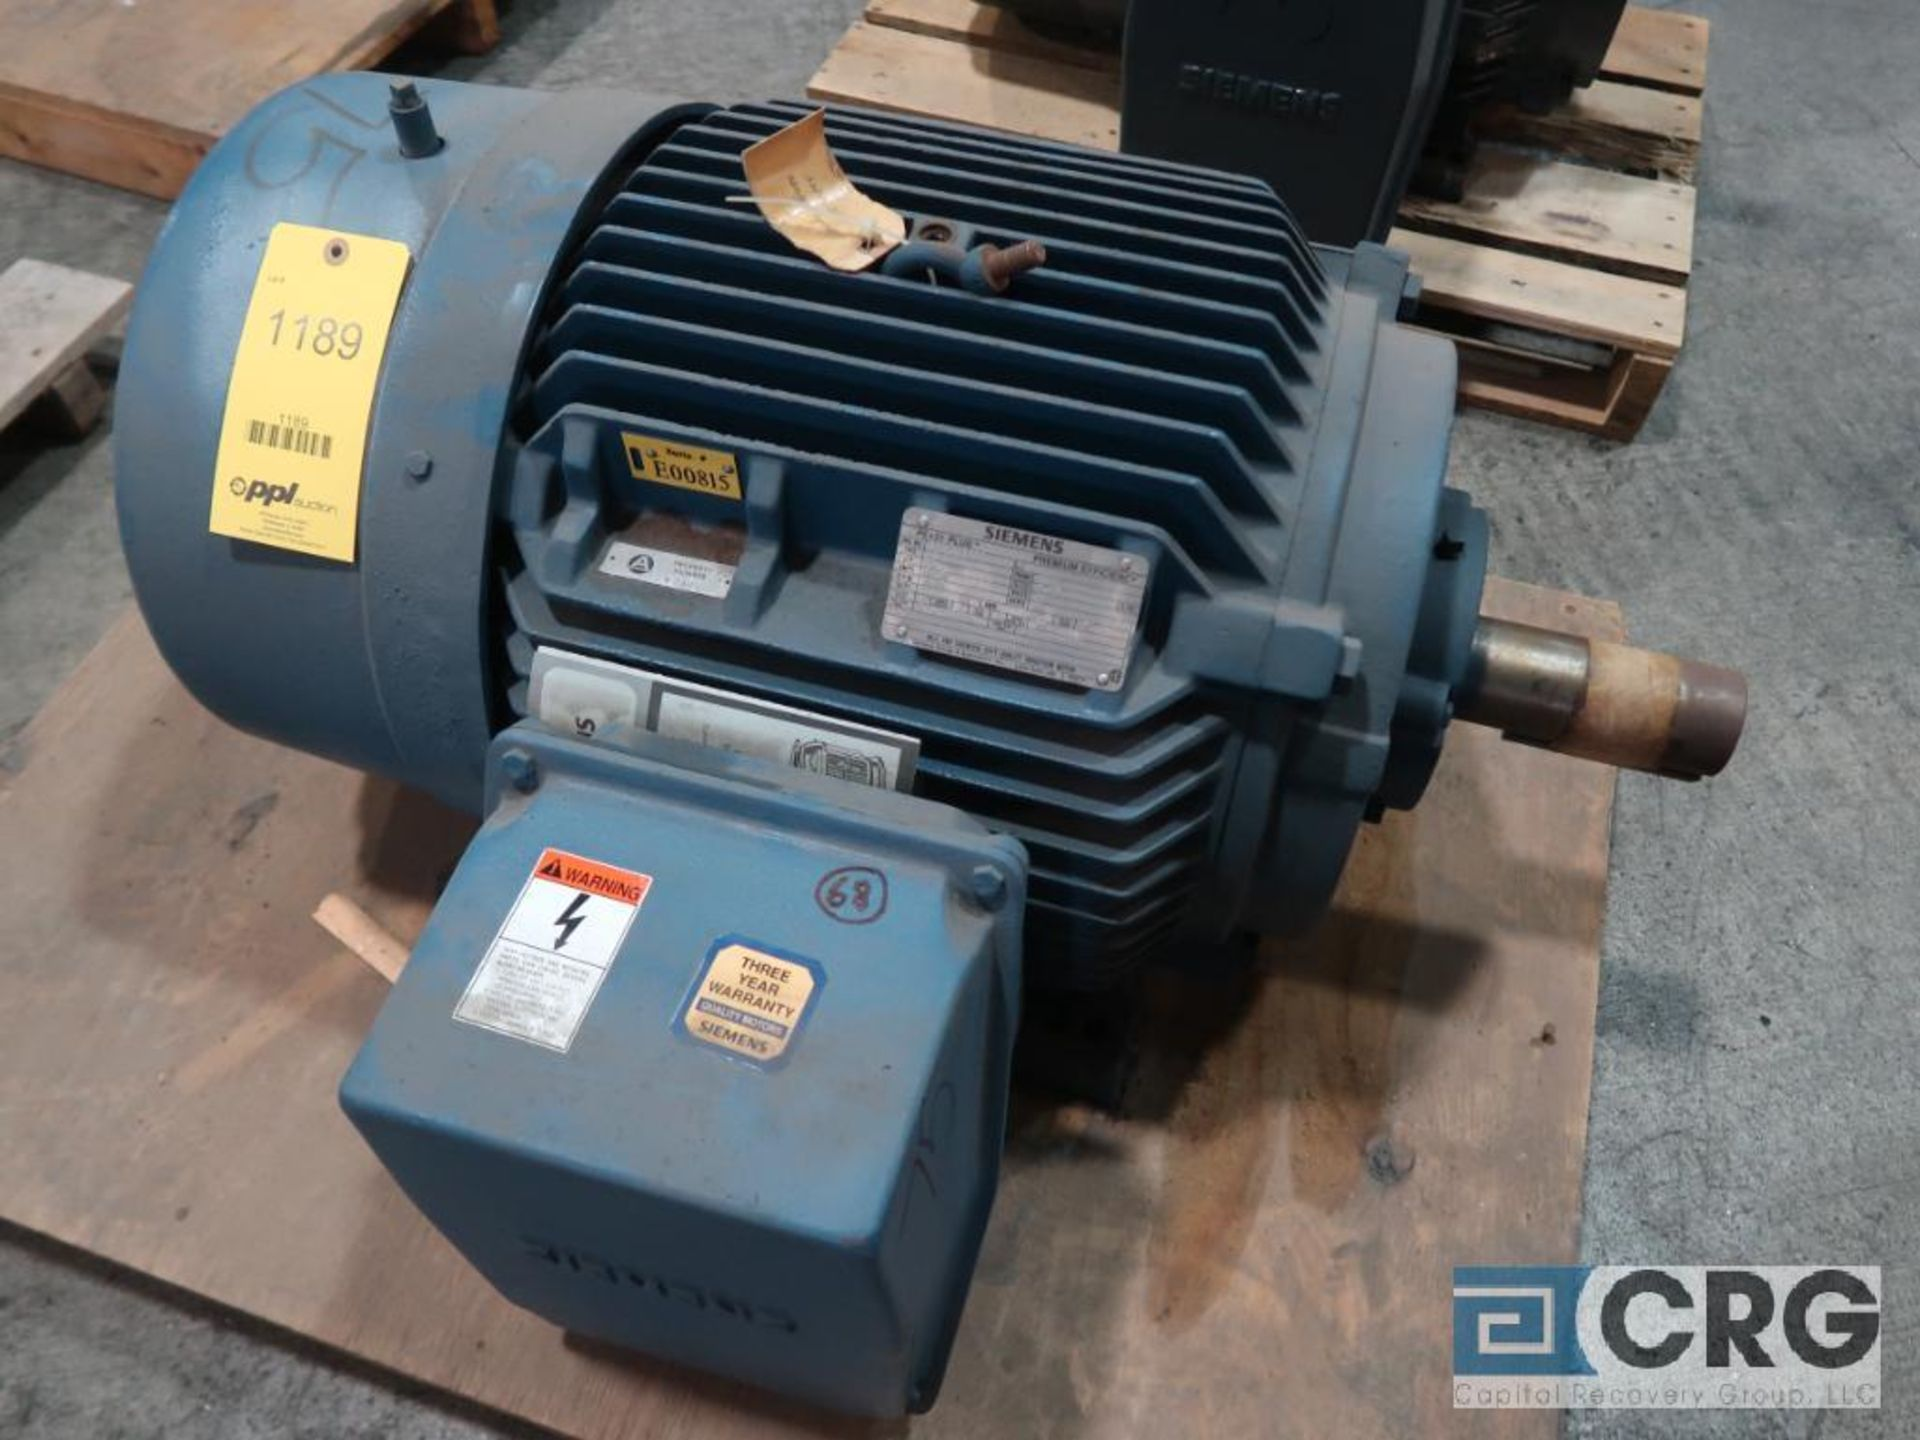 Siemens PE-21 PLUS motor, 75 HP, 3,545 RPMs, 460 volt, 3 ph., 356T frame (Finish Building)